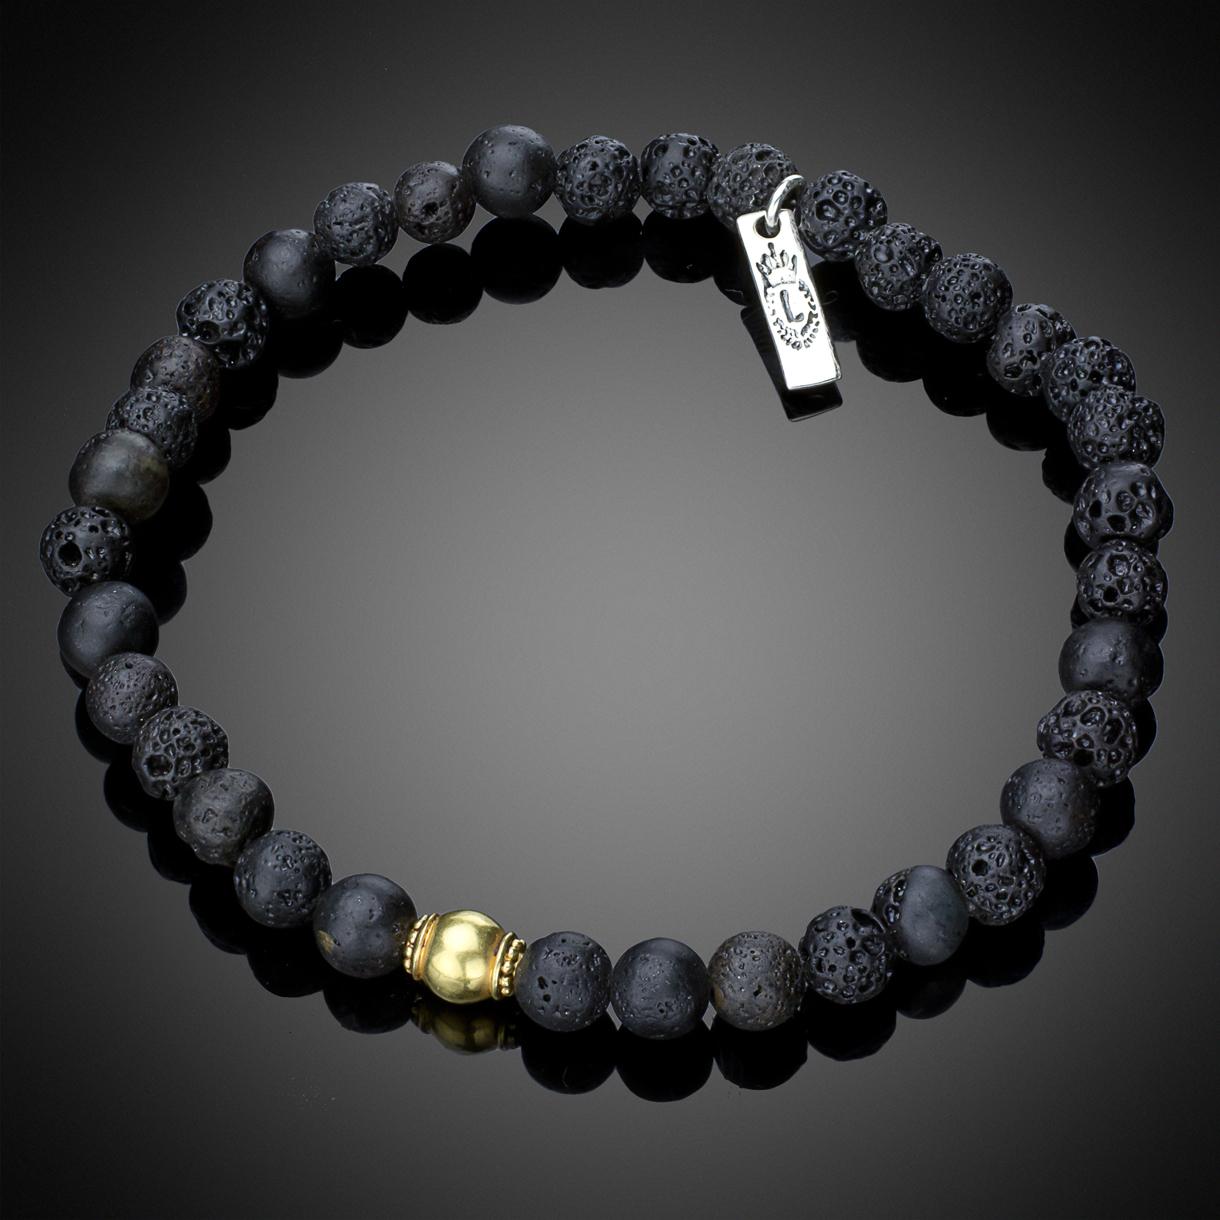 18K Gold Lava Bead Bracelet